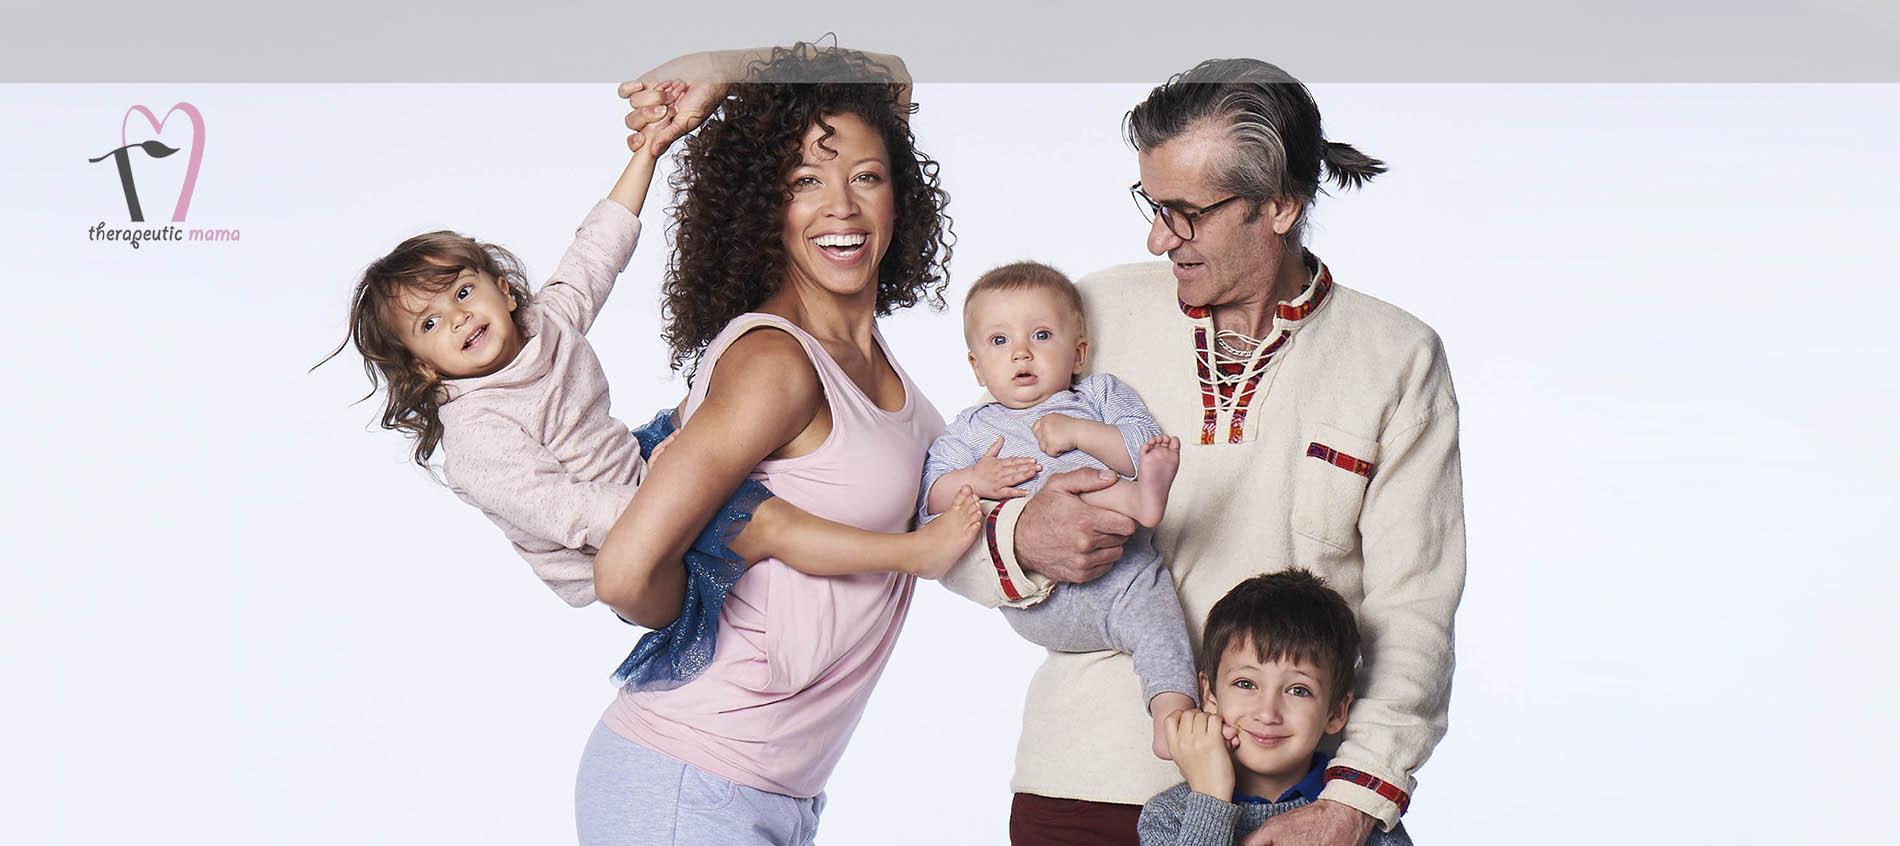 Poród domowy – wywiad